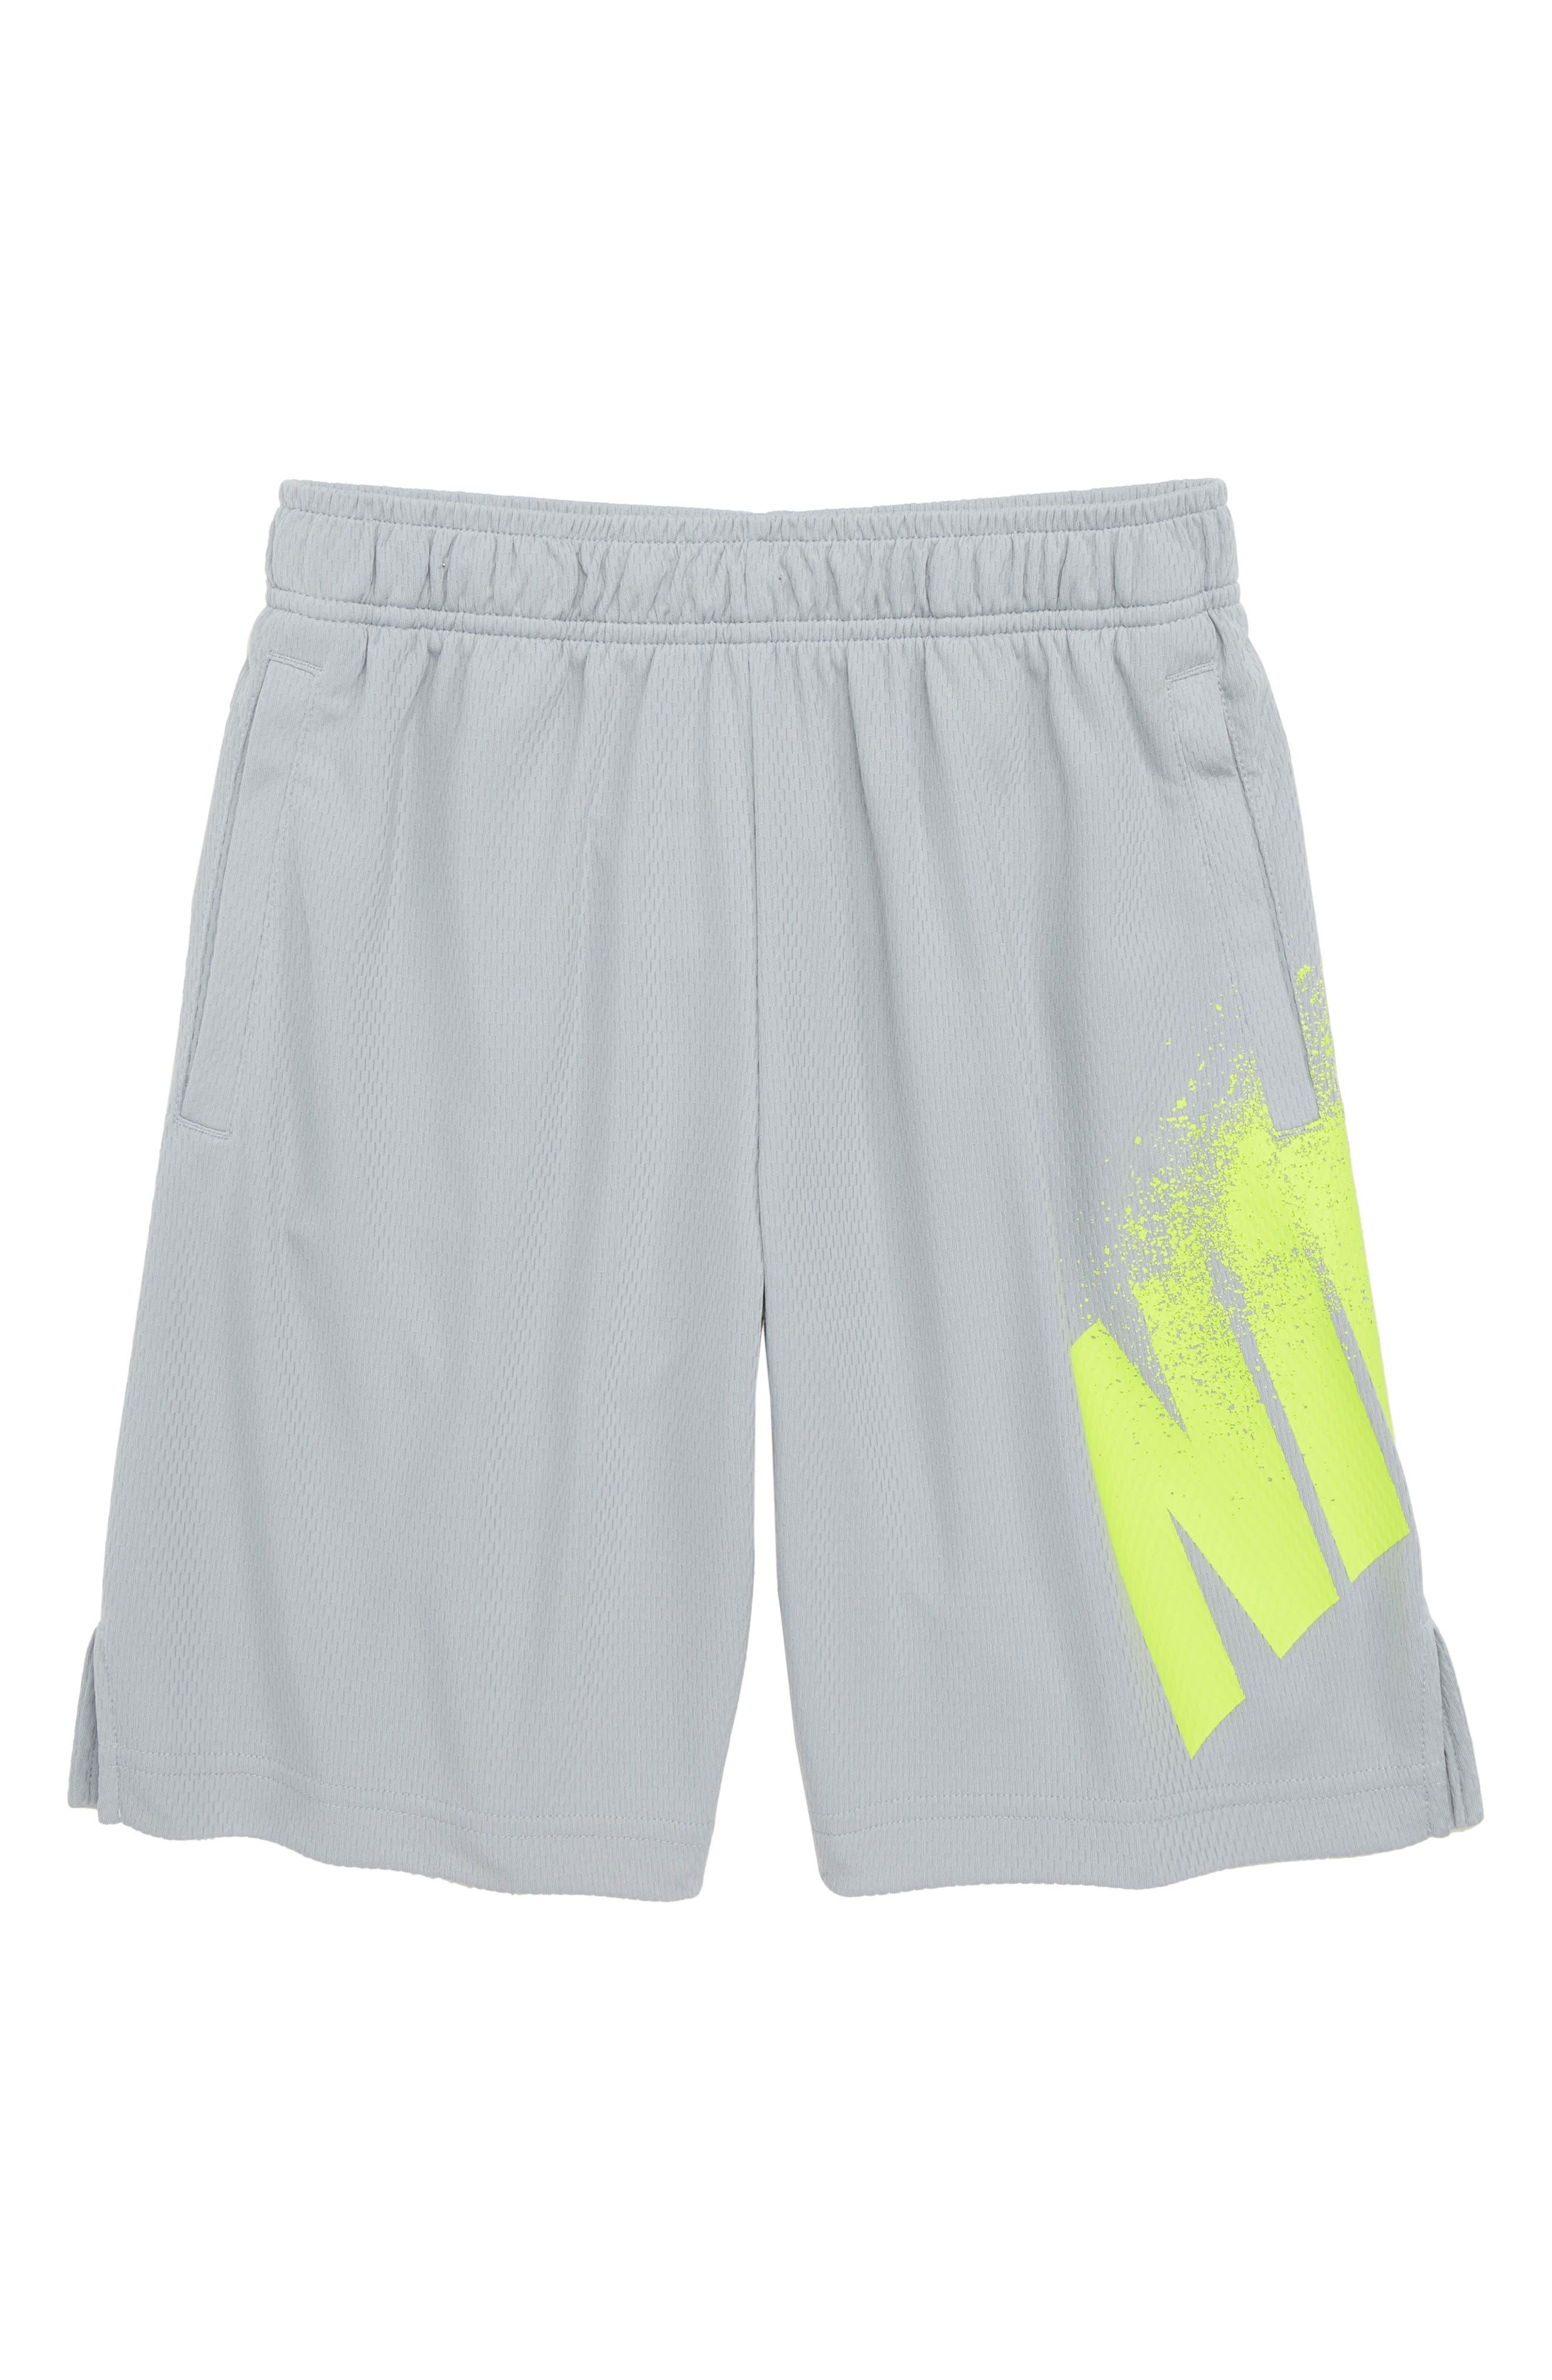 Dry GFX Athletic Shorts,                             Main thumbnail 1, color,                             Wolf Grey/ Volt